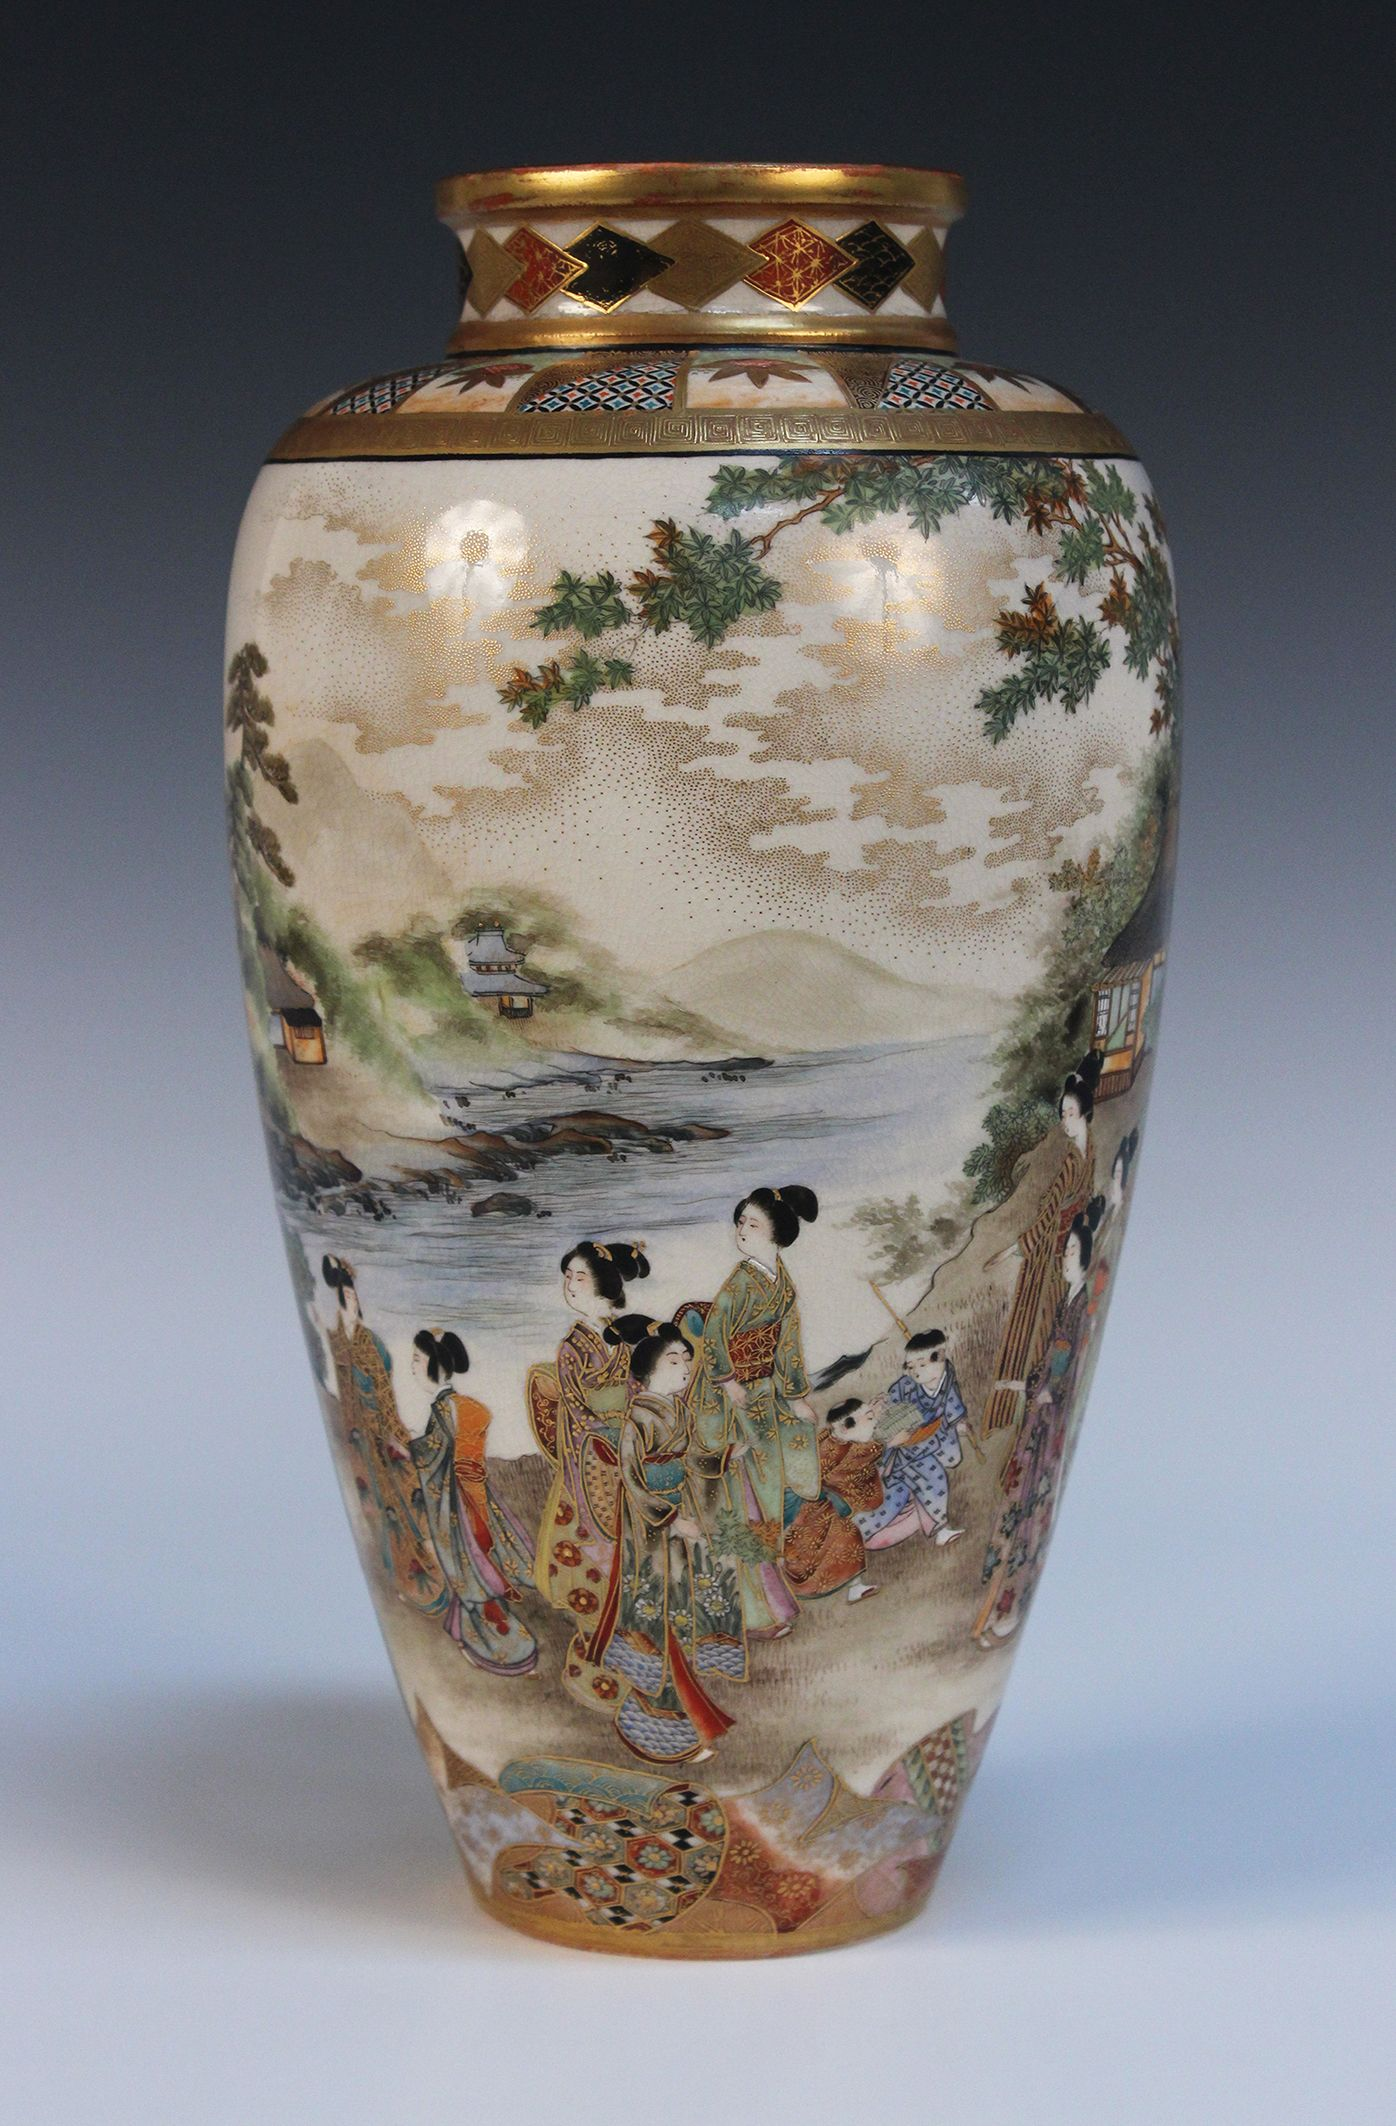 A japanese satsuma earthenware vase by ryozan for the yasuda a japanese satsuma earthenware vase by ryozan for the yasuda company reviewsmspy